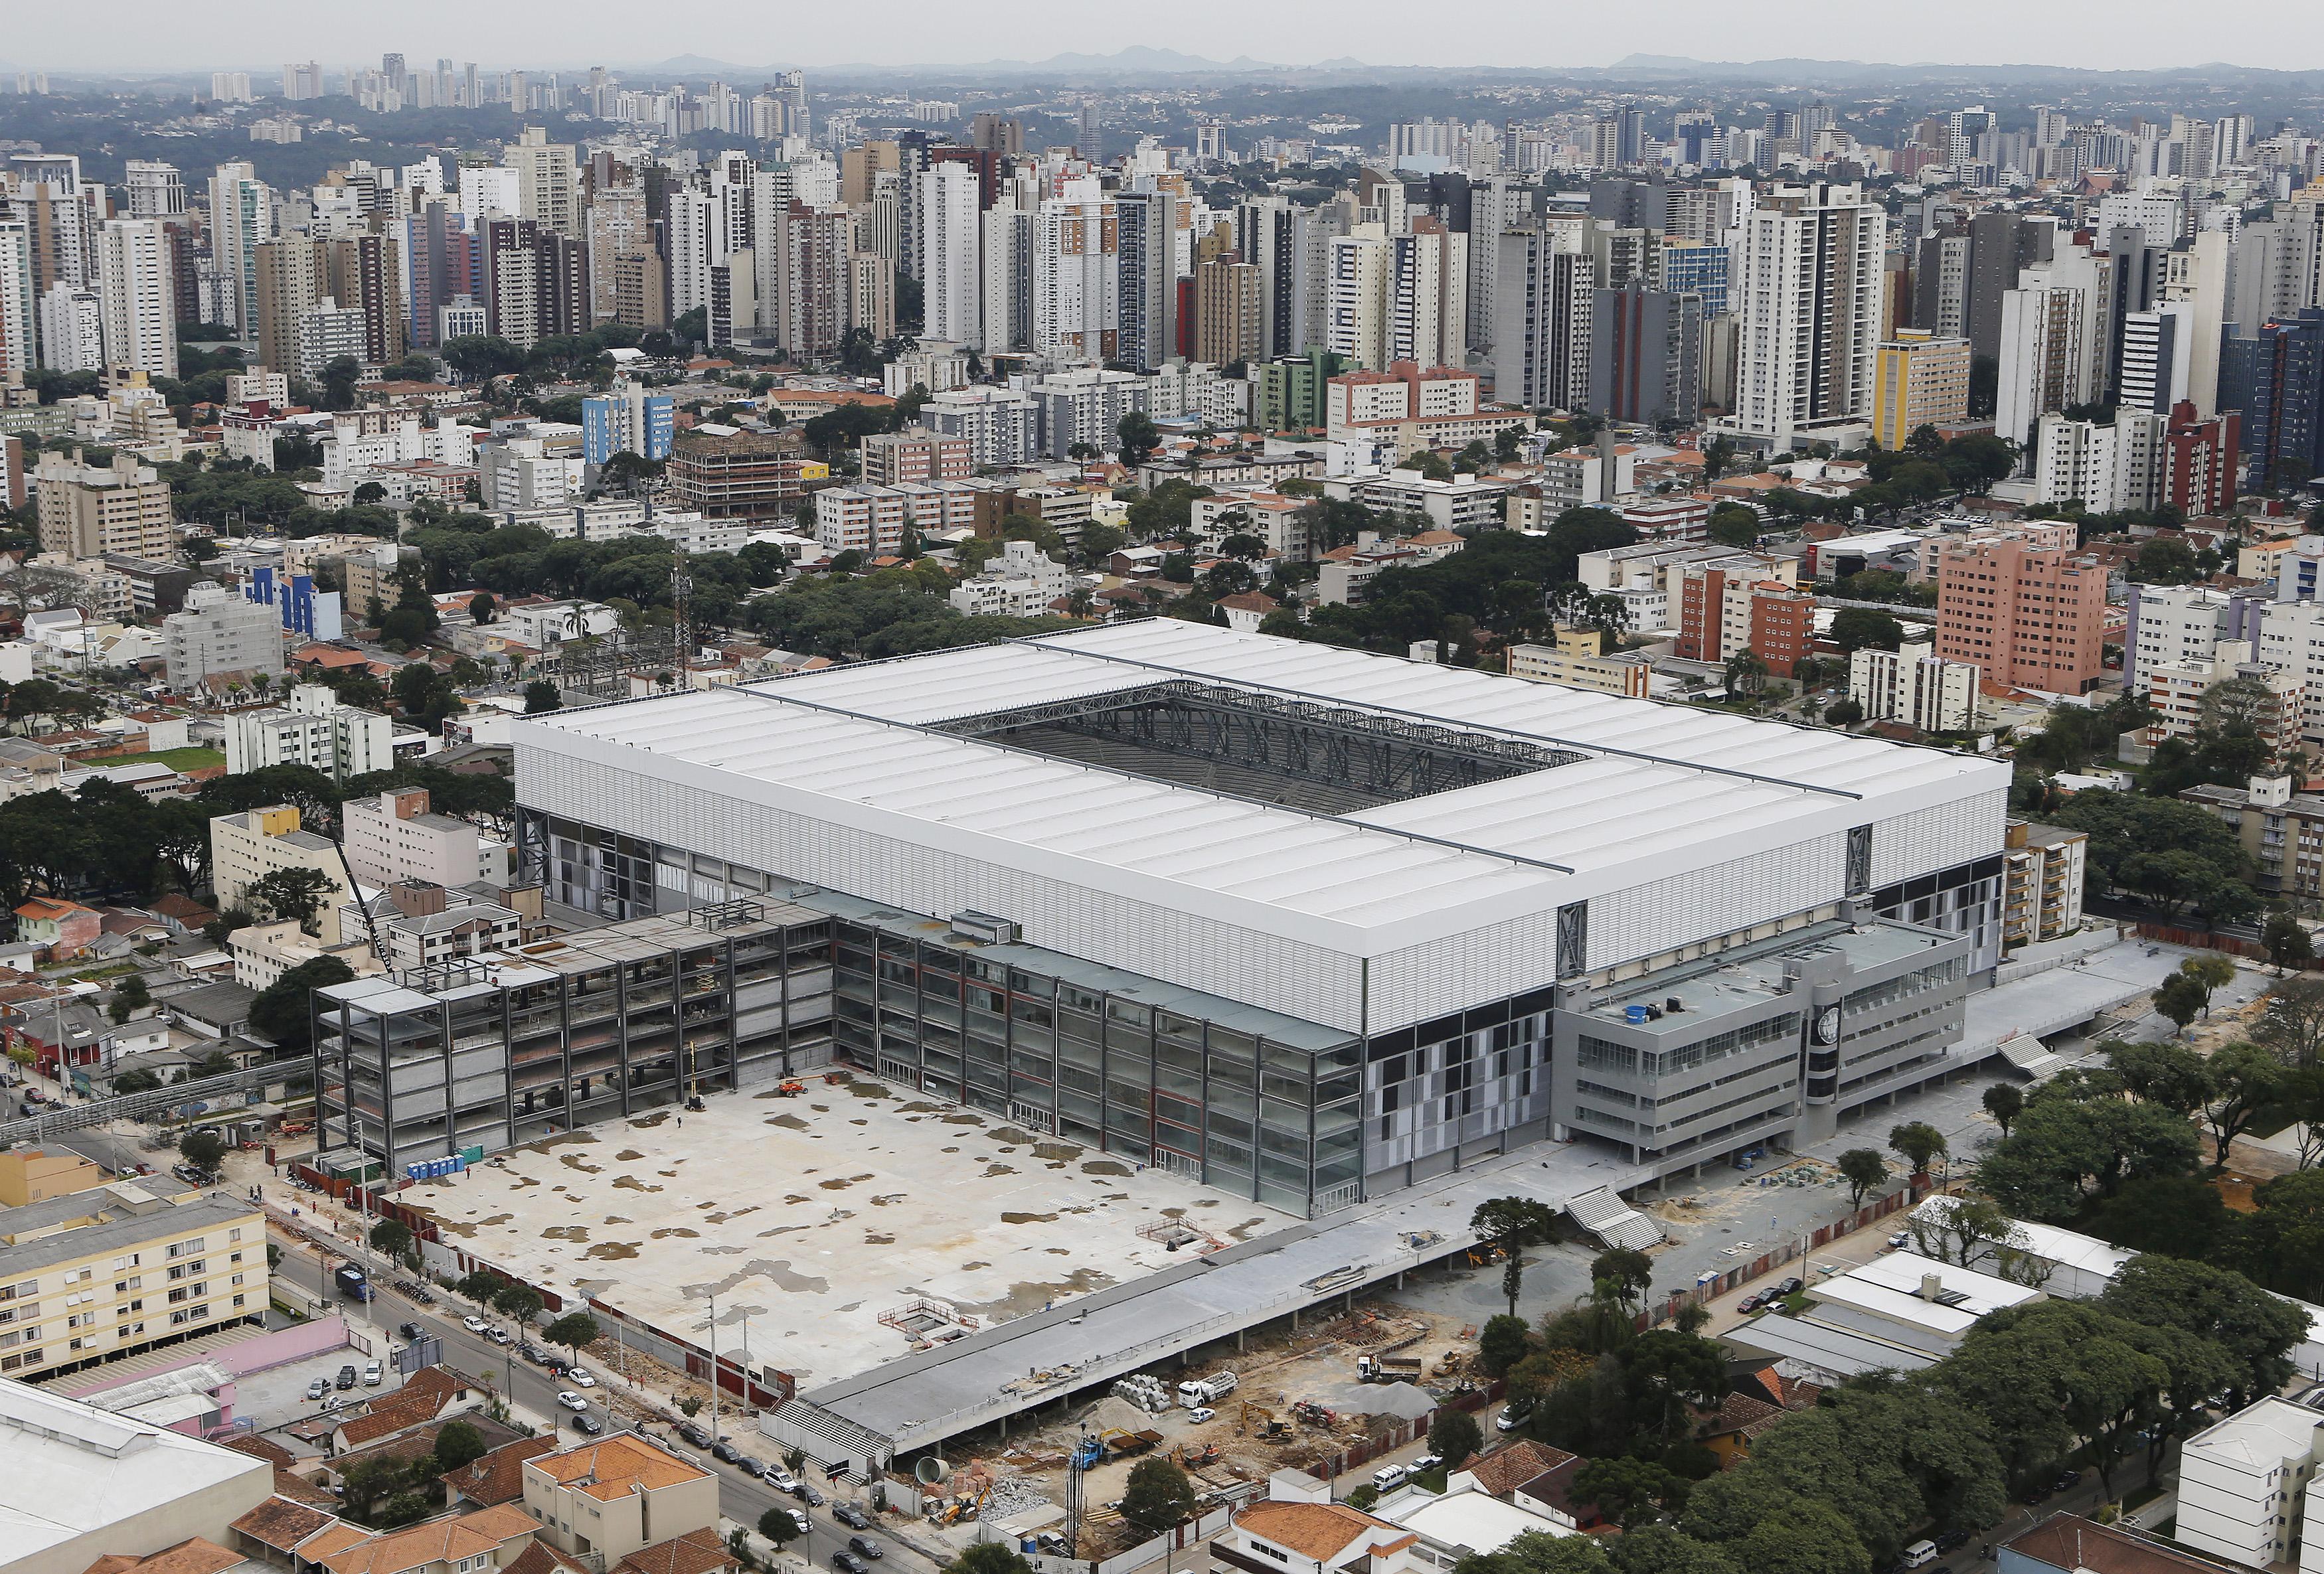 Arena da Baixada                                                              City: Curitiba                                                              Constructed: 1914                                                              Capacity: 38,500